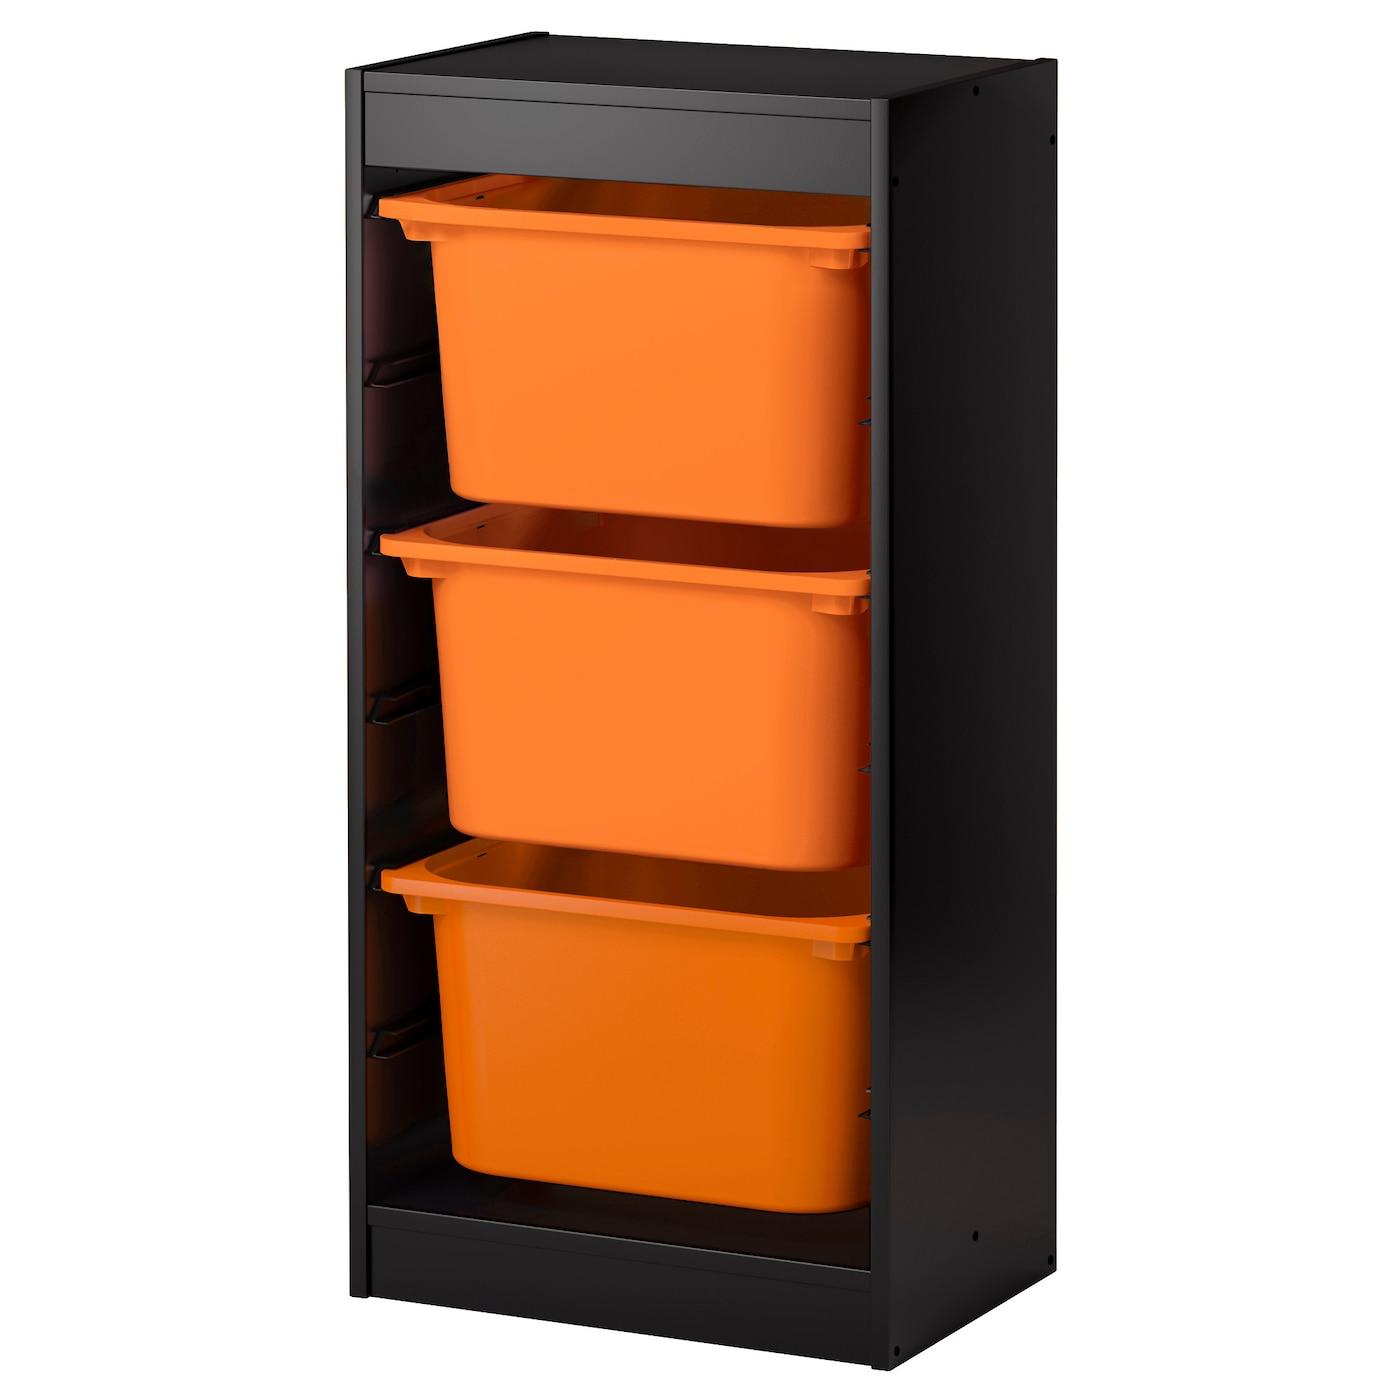 trofast combinaci n de armario y estanter a negro naranja 46 x 30 x 94 cm ikea. Black Bedroom Furniture Sets. Home Design Ideas